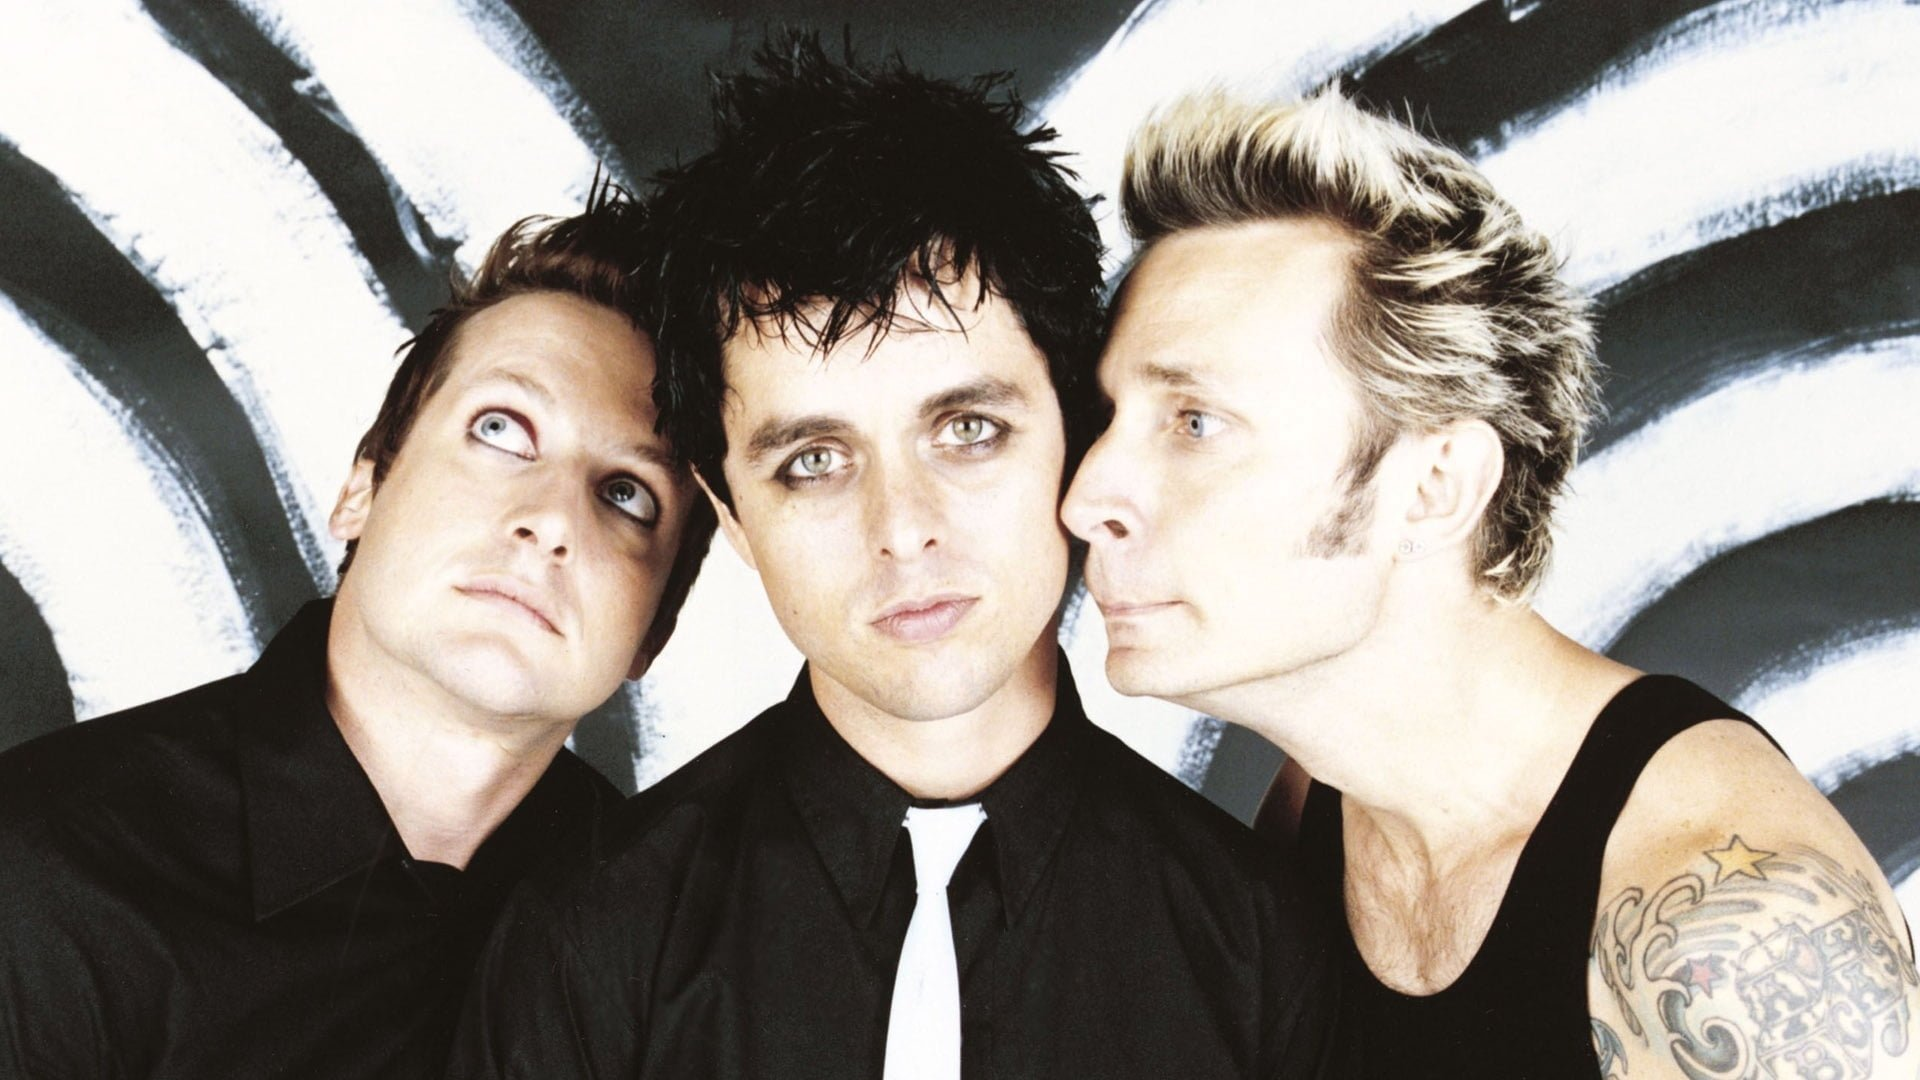 Green Day Wallpaper Full HD